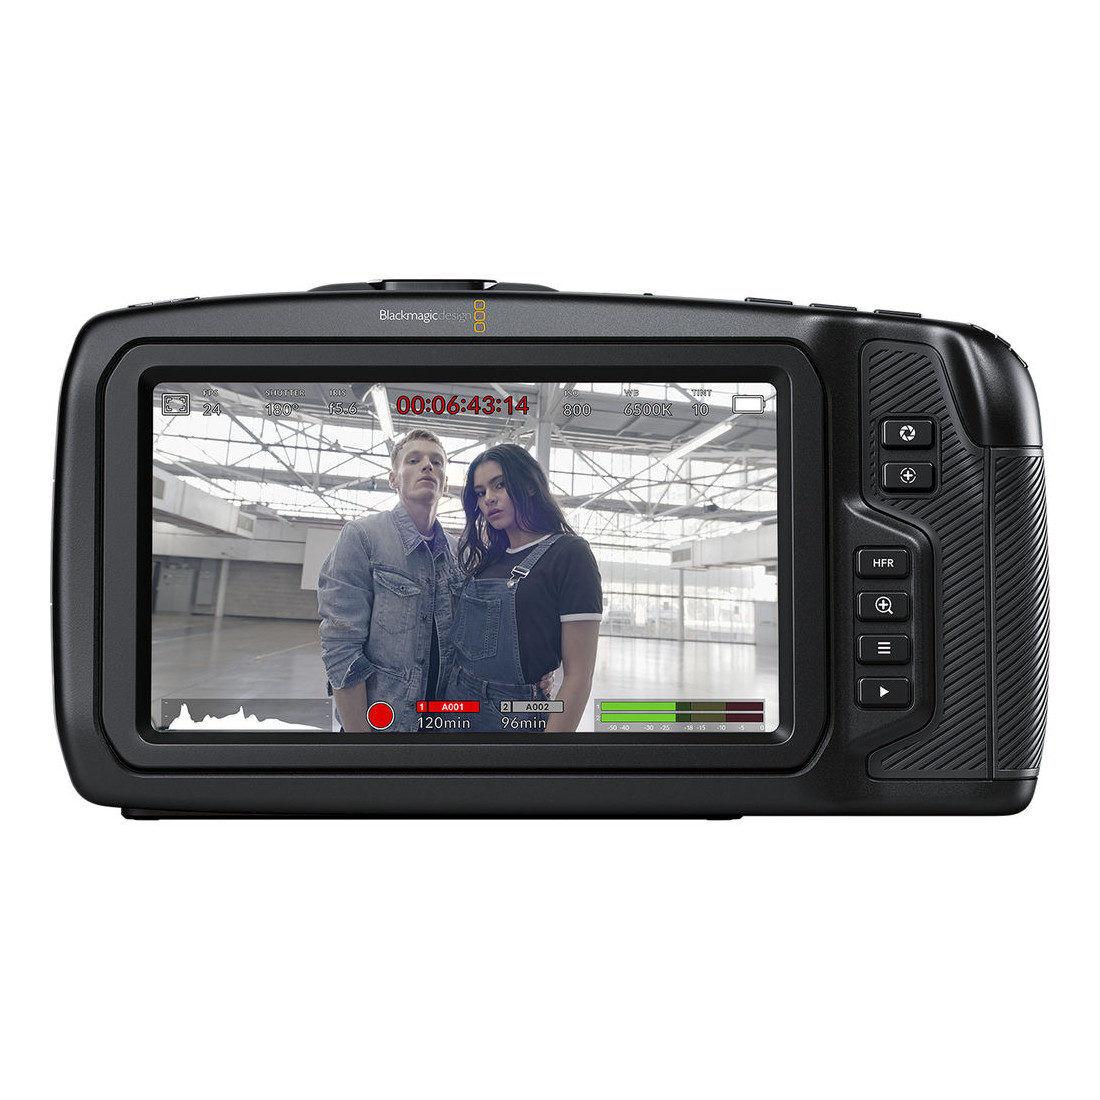 Blackmagic Pocket Cinema 6K Videocamera Body EF - Promo valida fino al 13 Ottobre